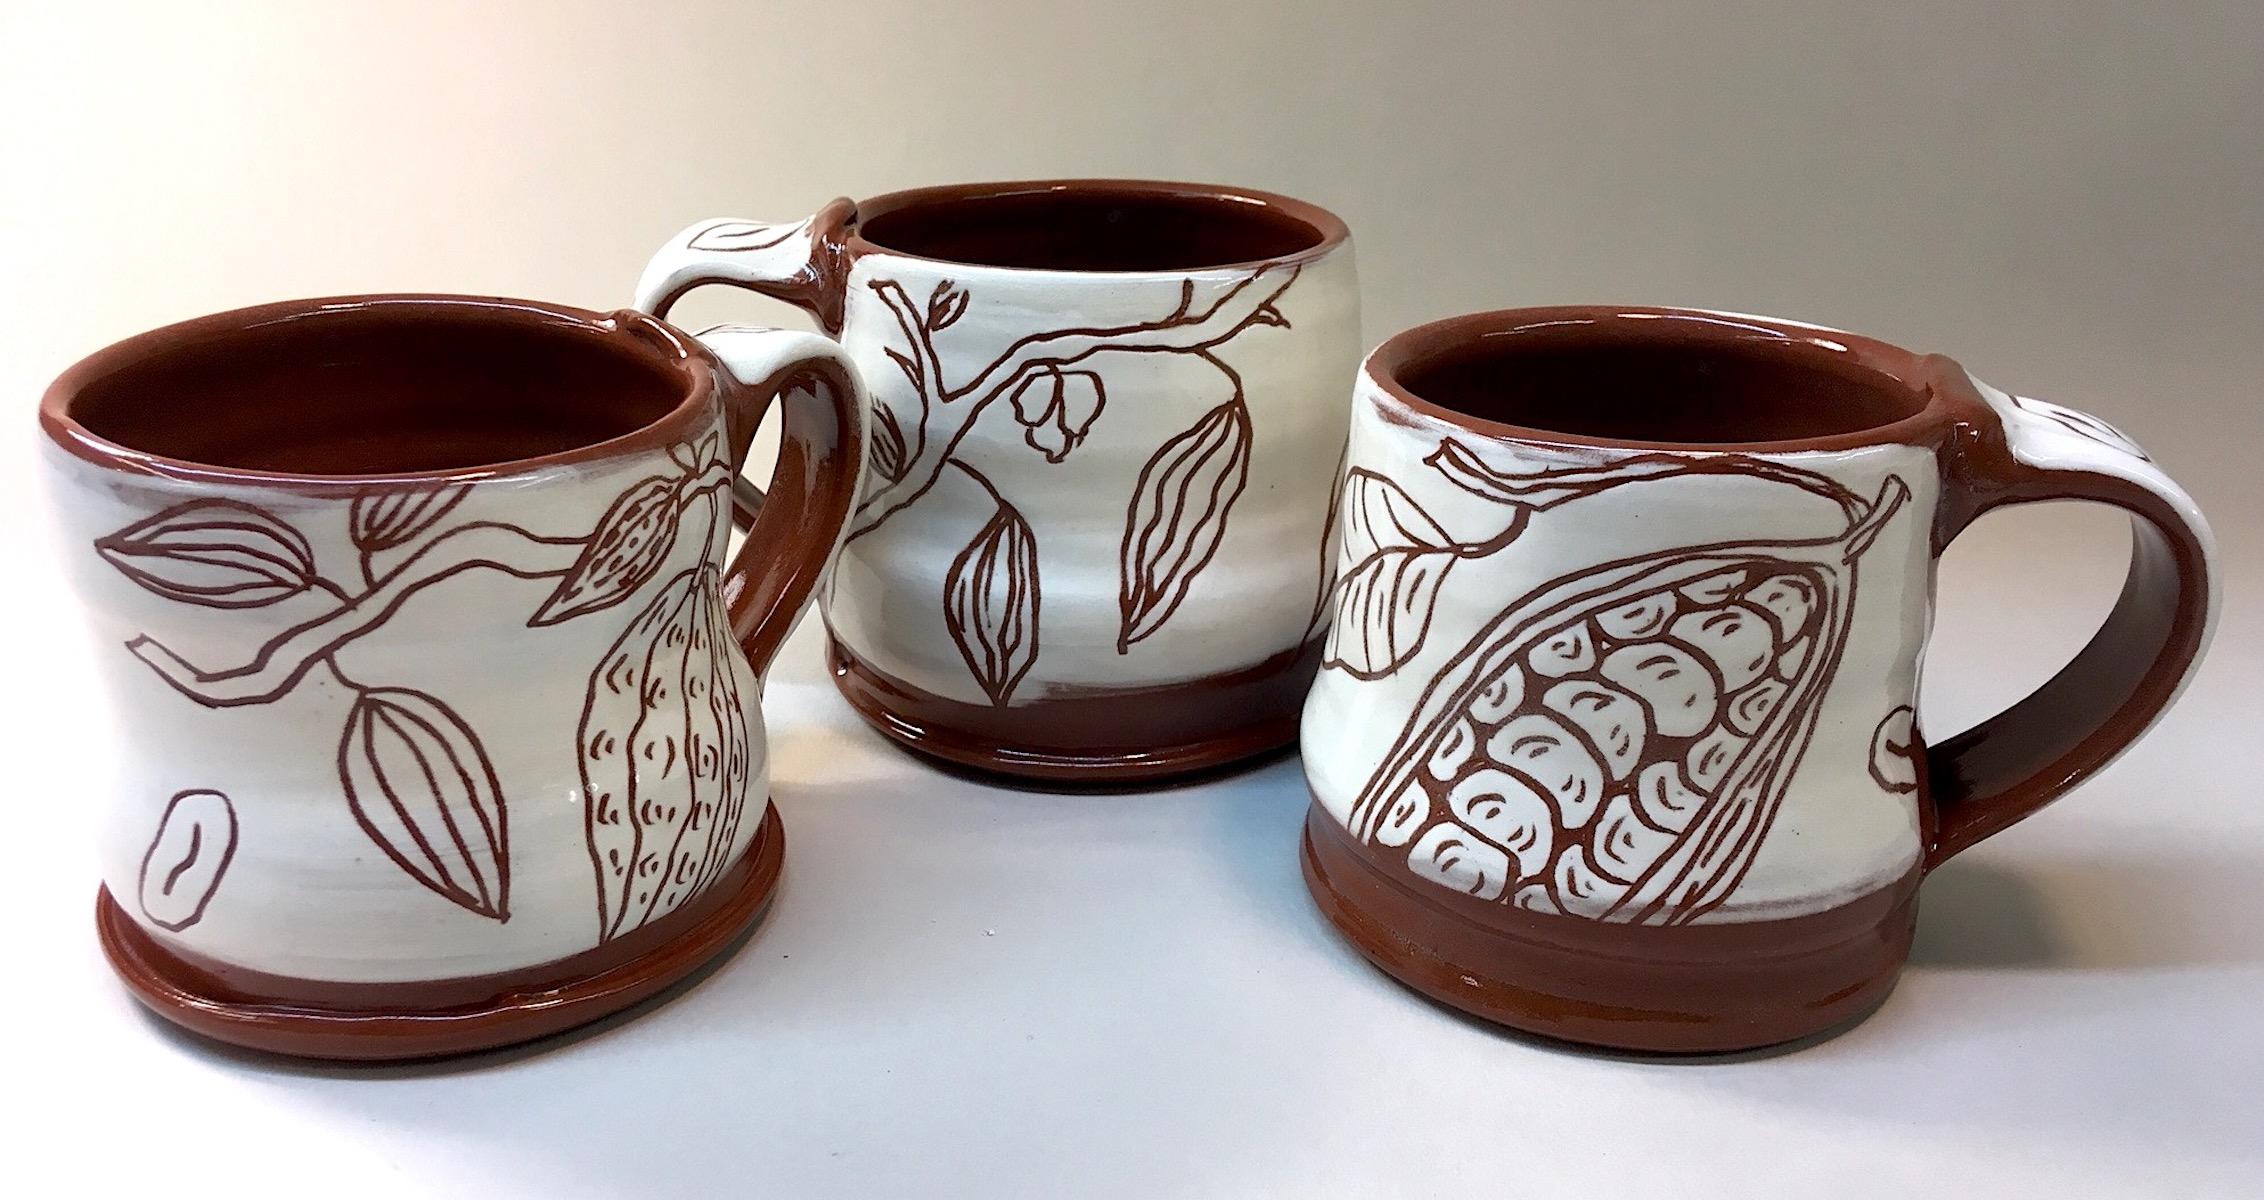 ckreitzer_cocoa bean cups_JPEG.jpg